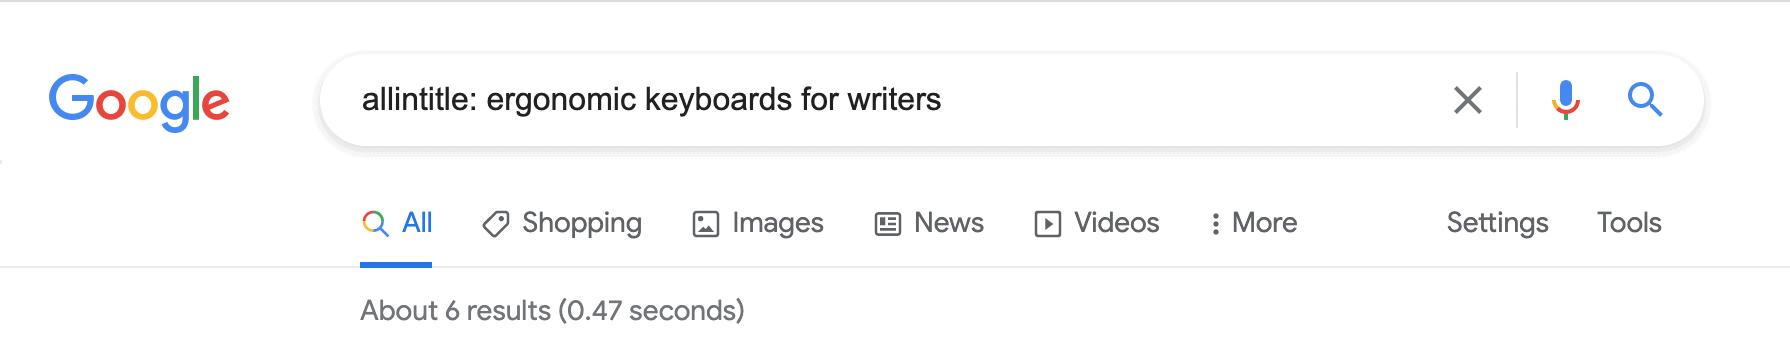 Google search notation: Allintitle